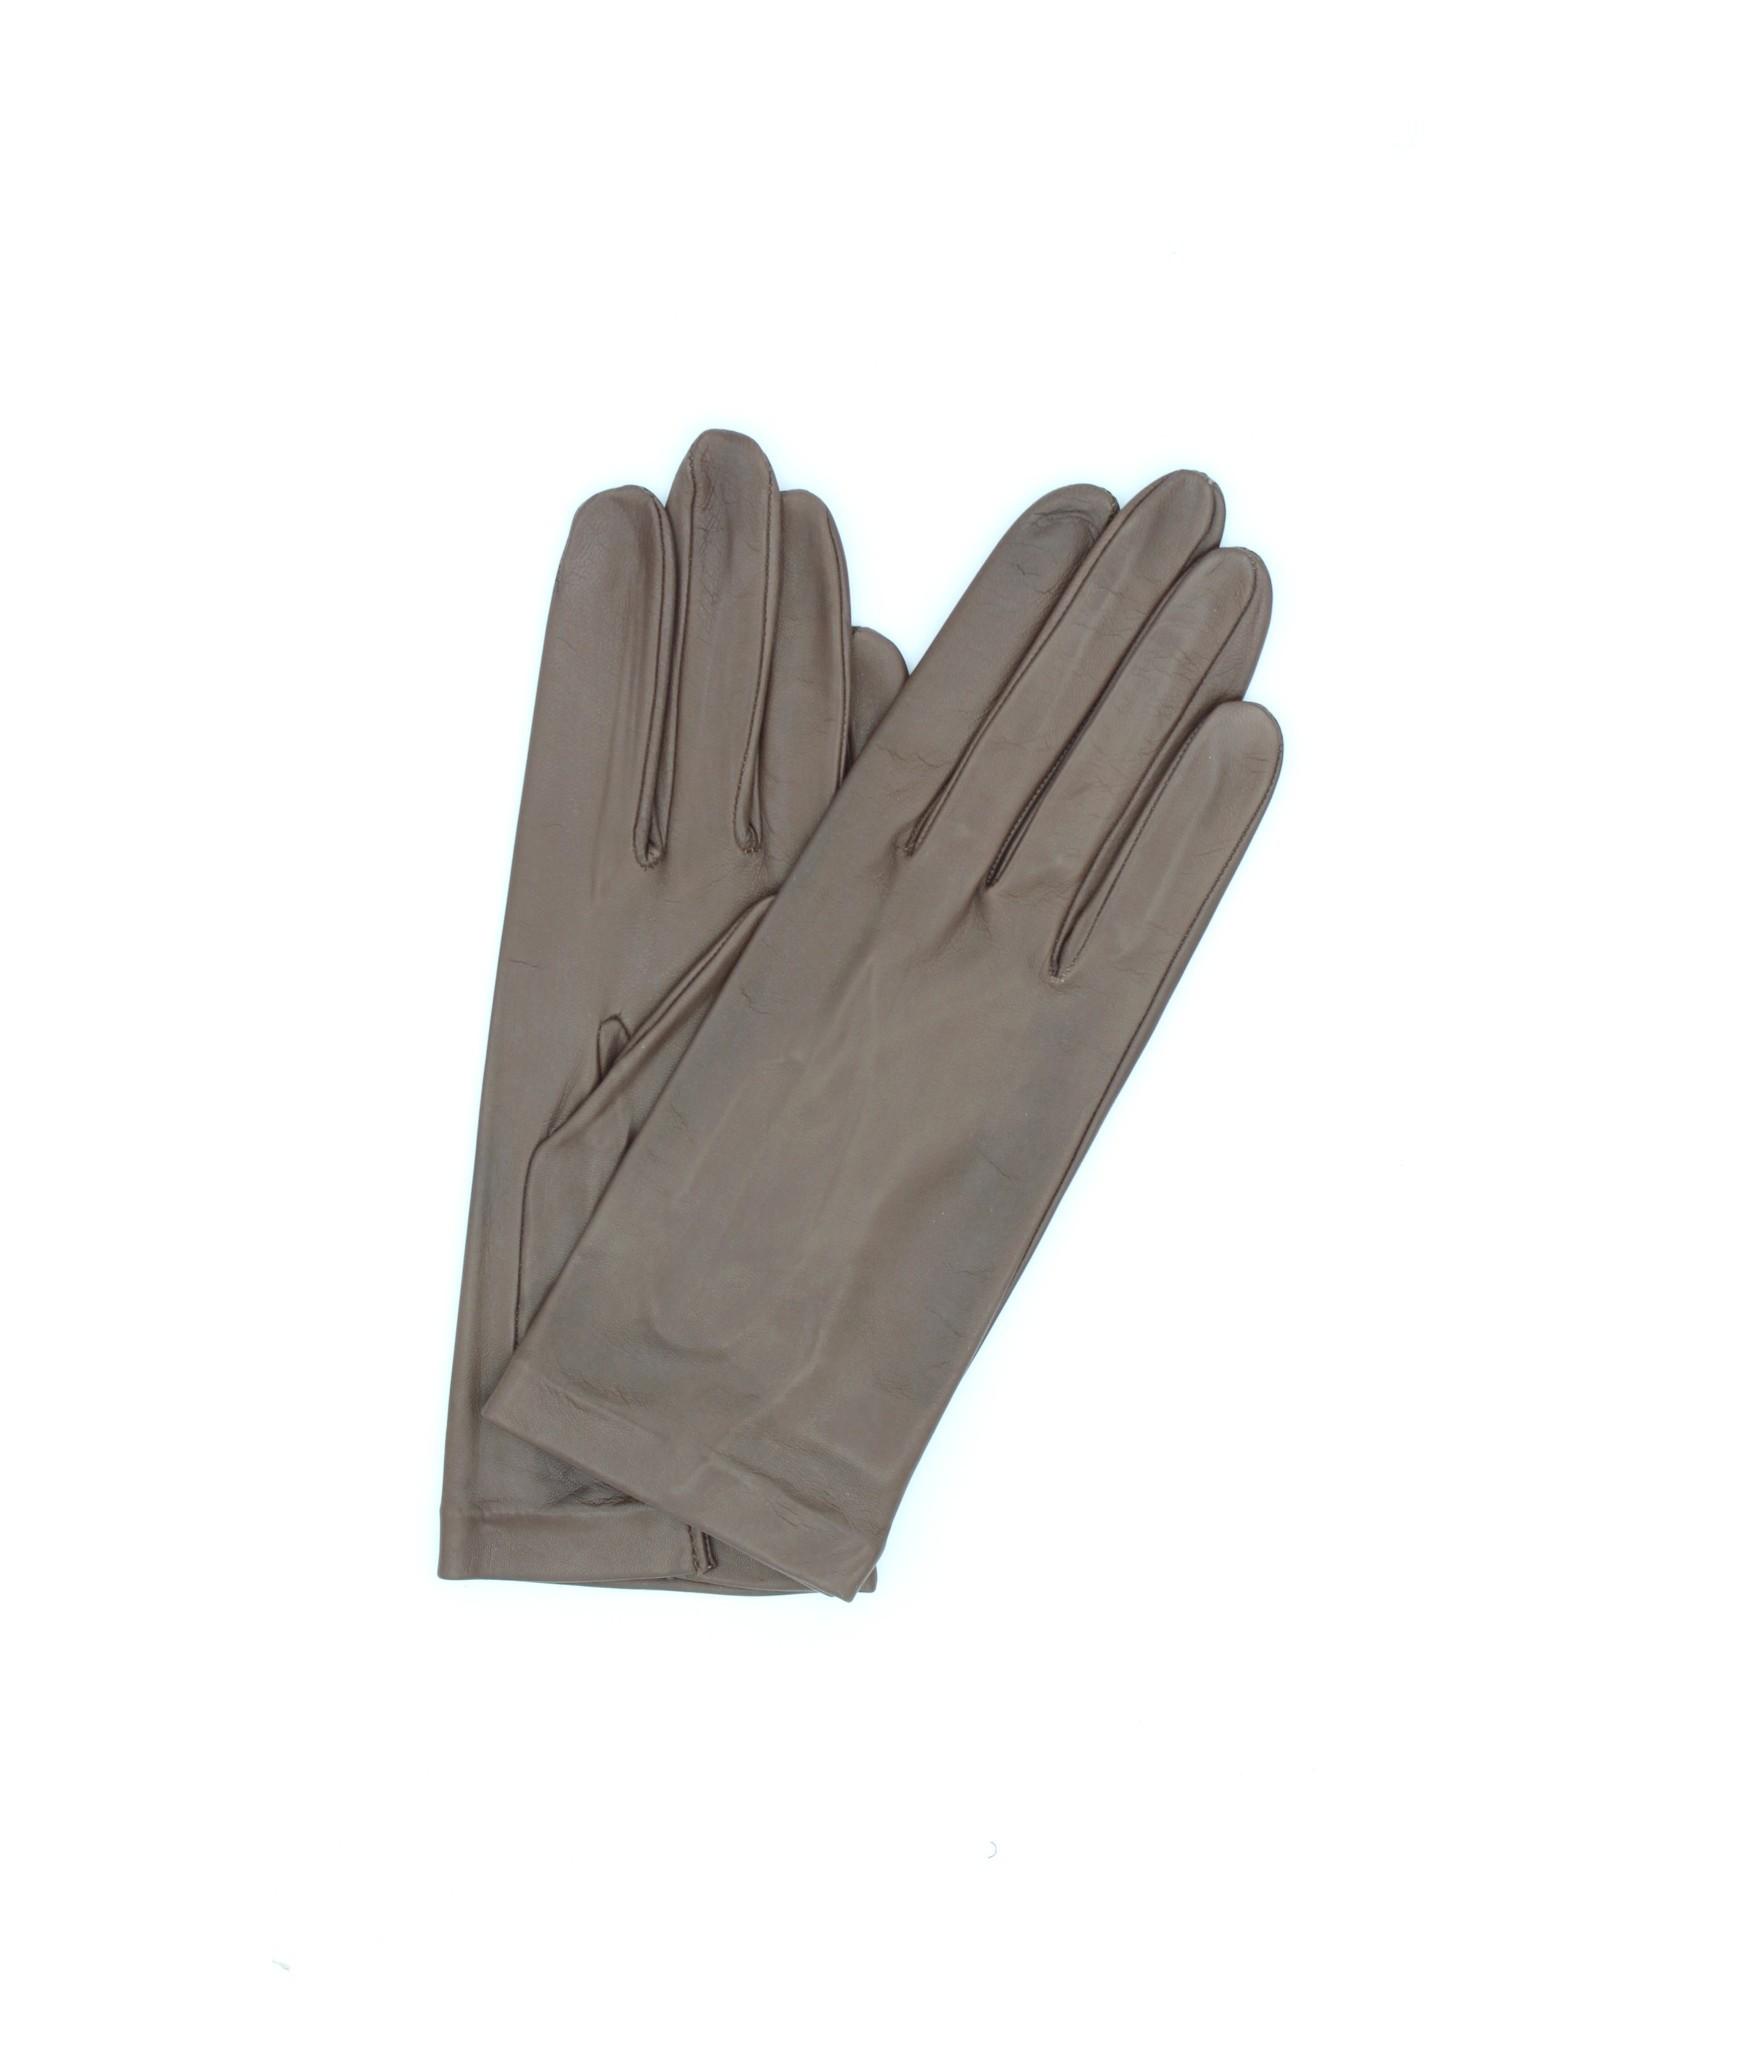 Nappa leather gloves 2bt unlined Mink Sermoneta Gloves Leather